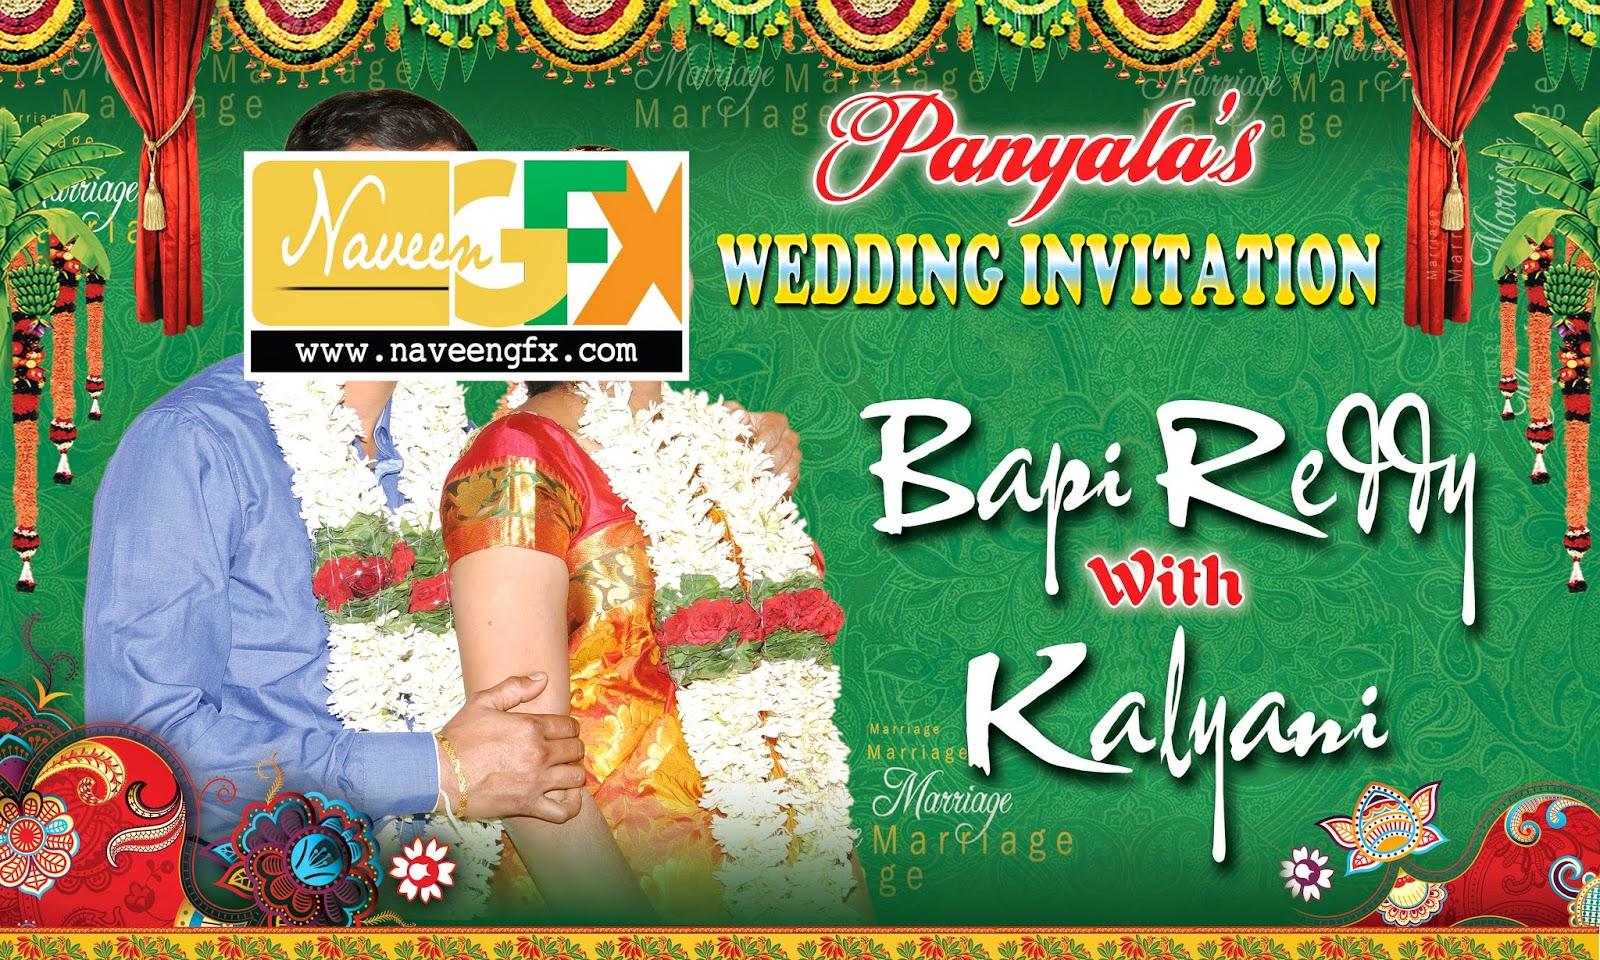 indian wedding psd flex banner templates free downloads ...